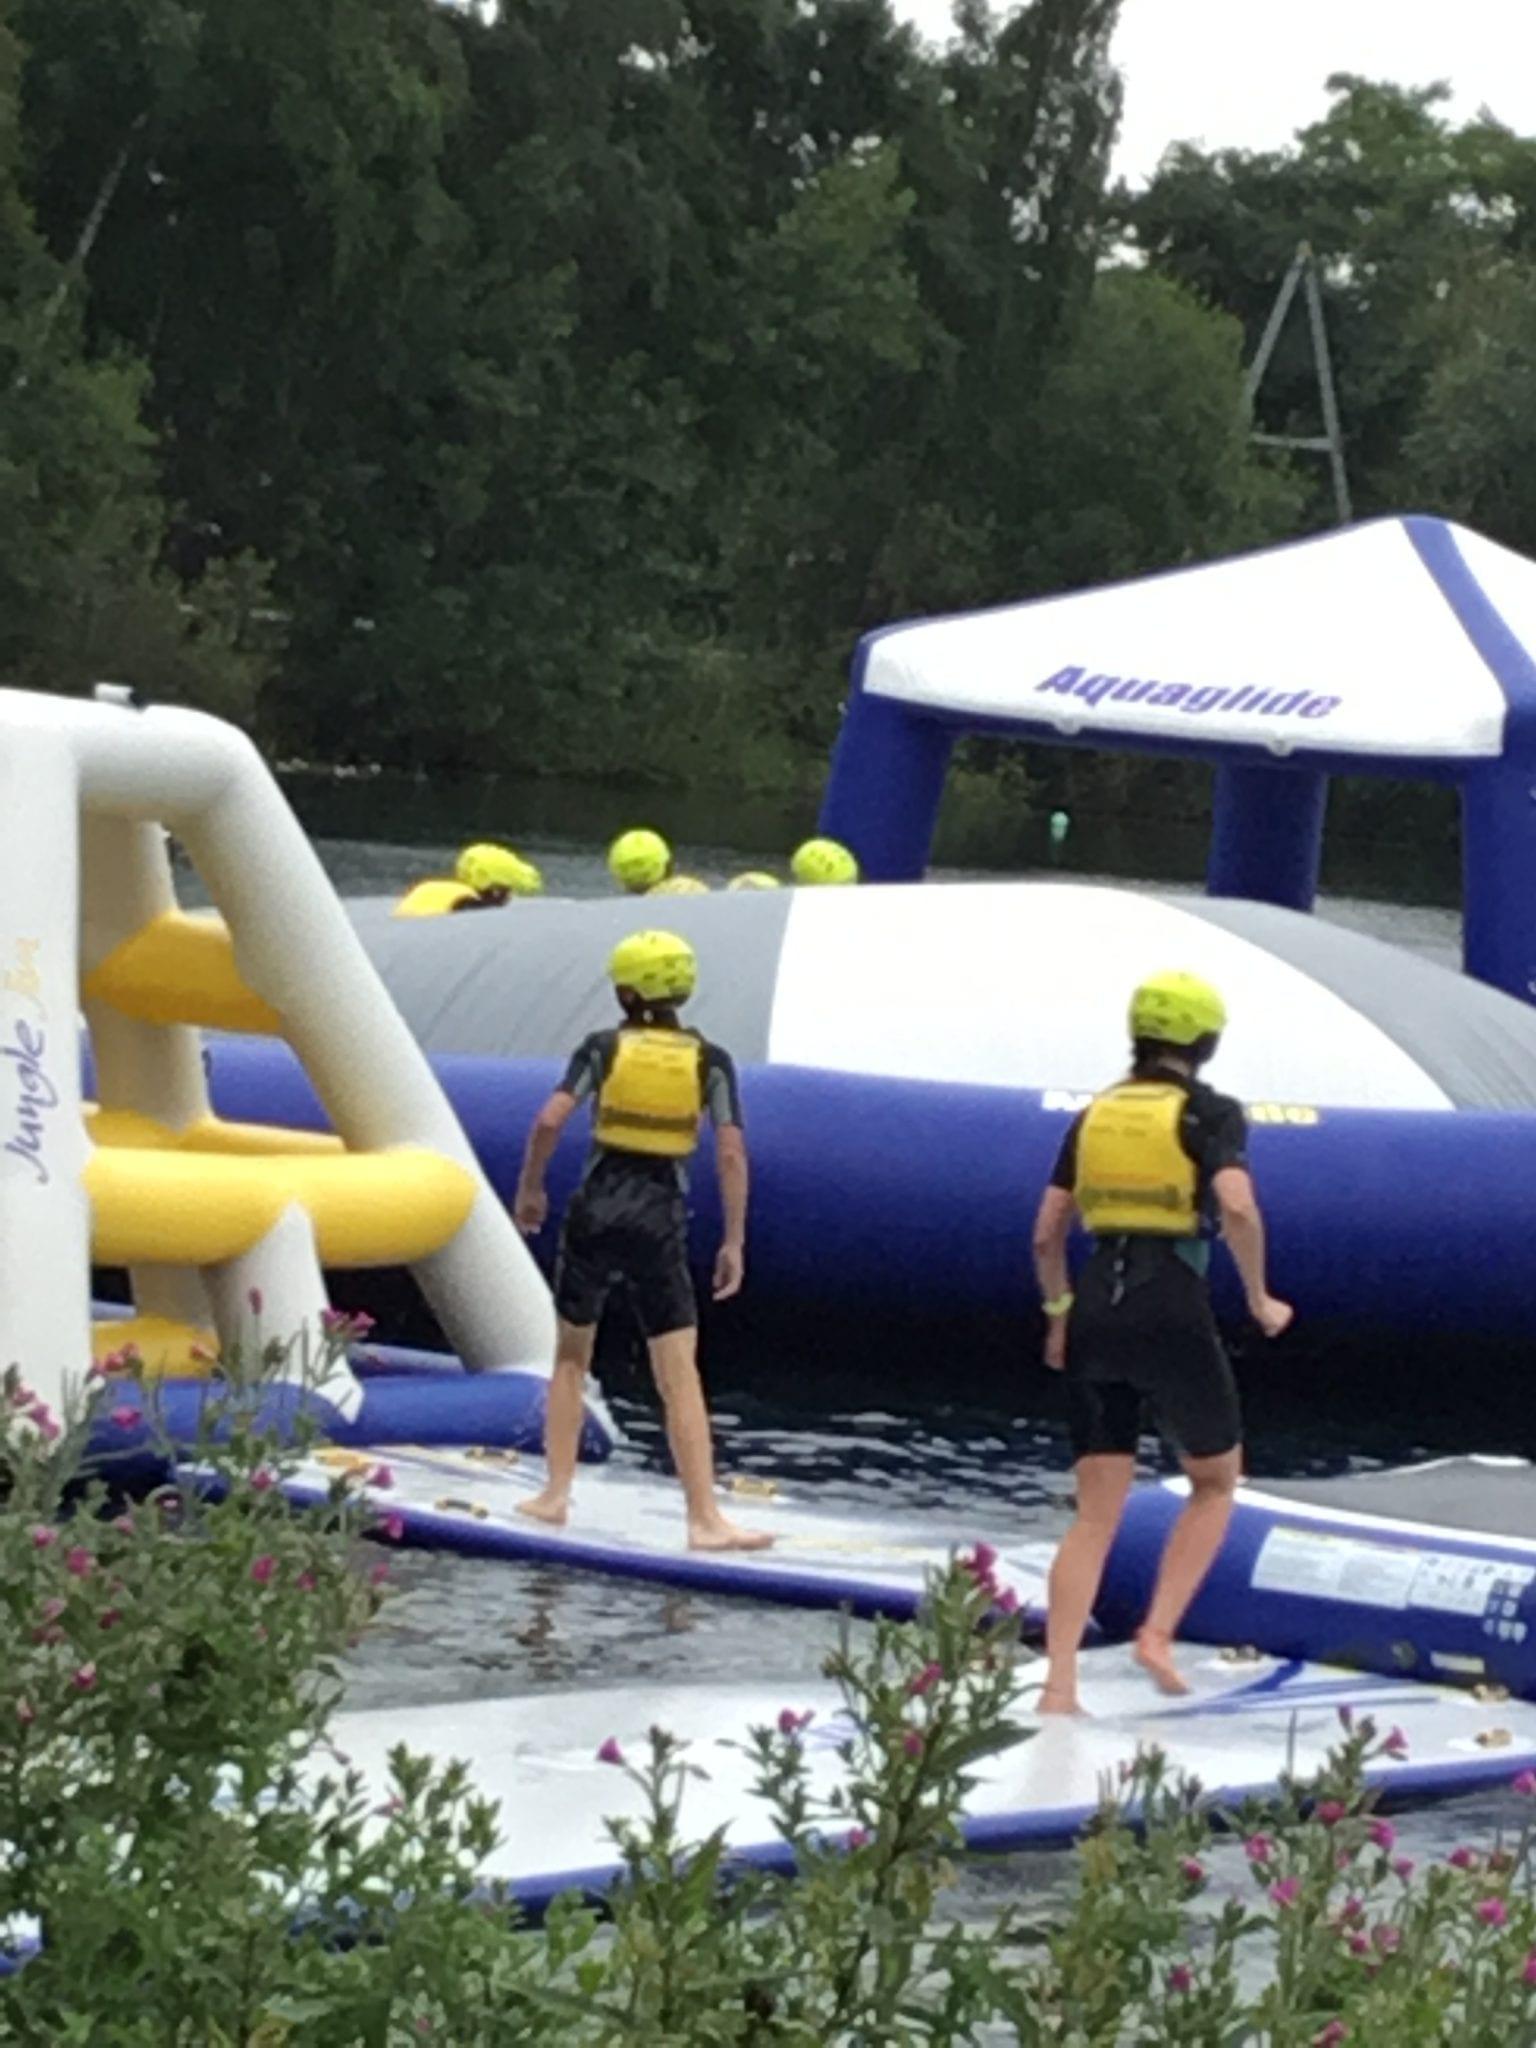 Tattershall Lake Aqua Park Phoenix Park Academy